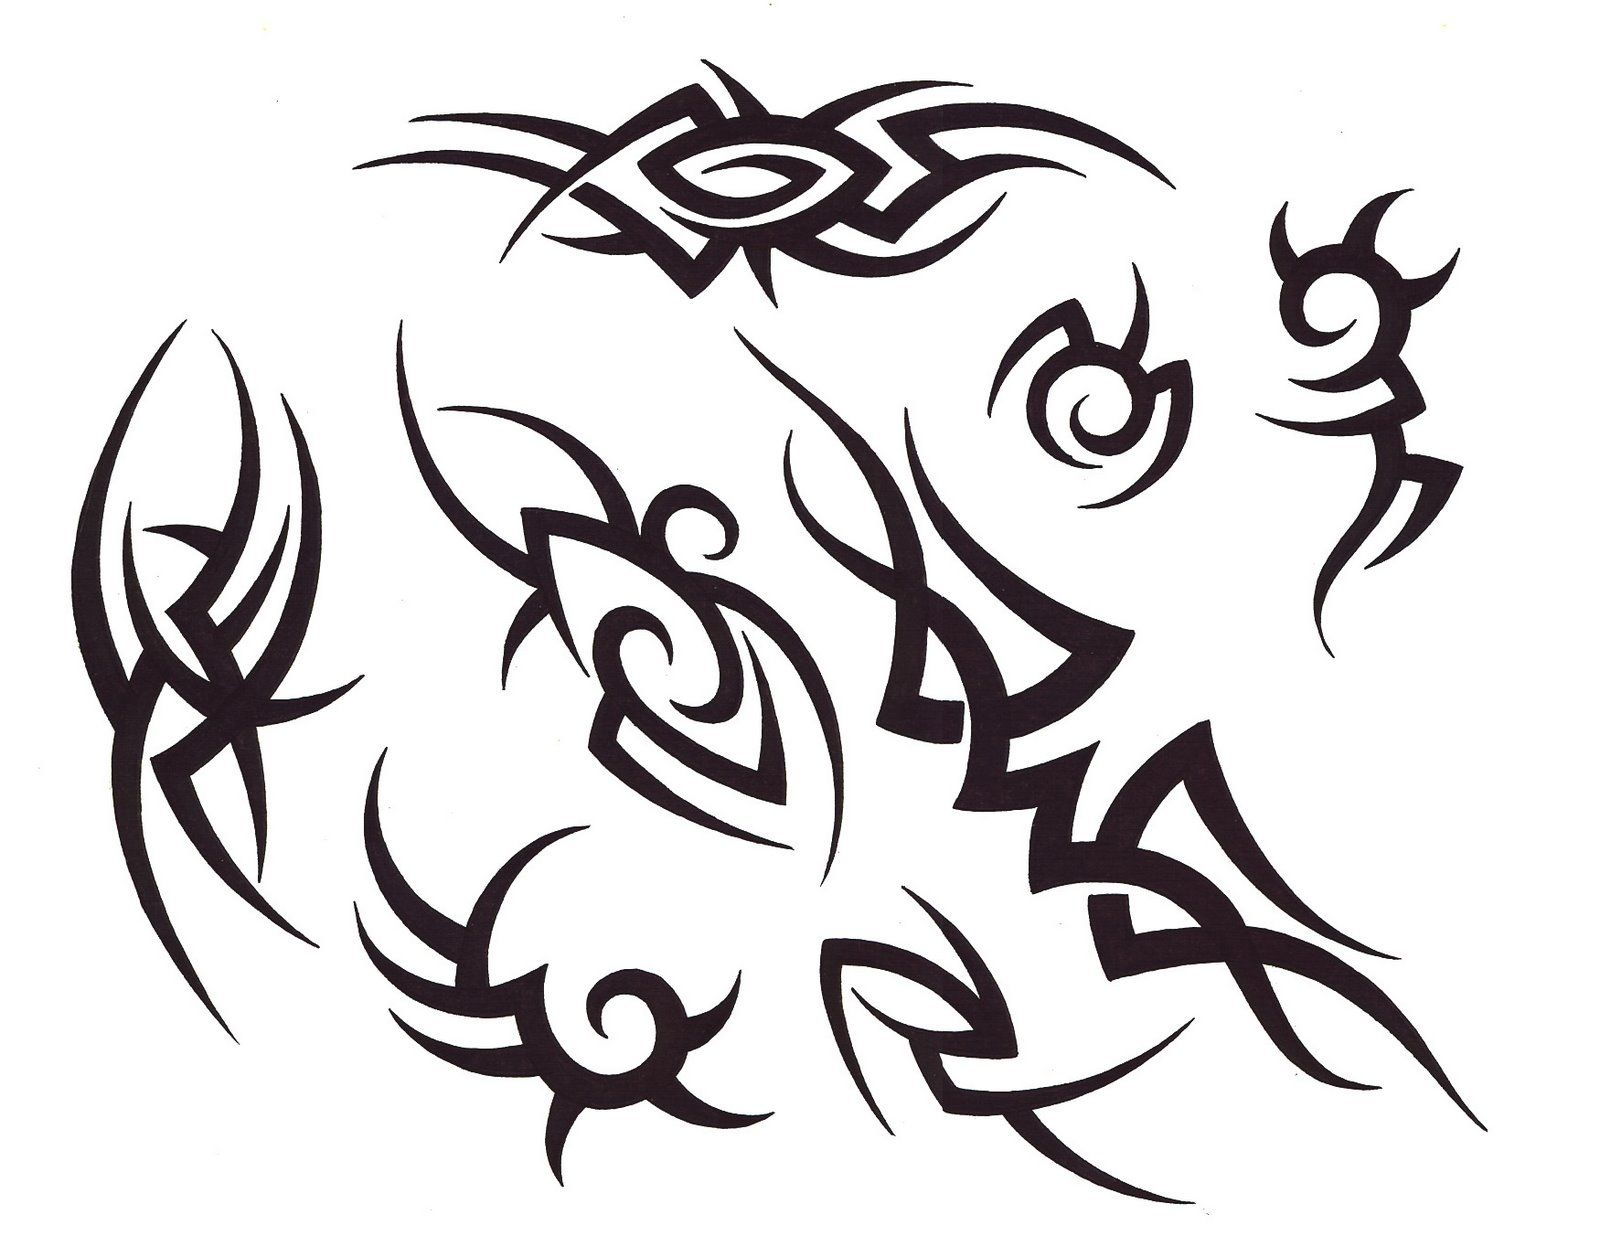 Tattoo Designs | tattoo alphabet designs-783 : Image ...